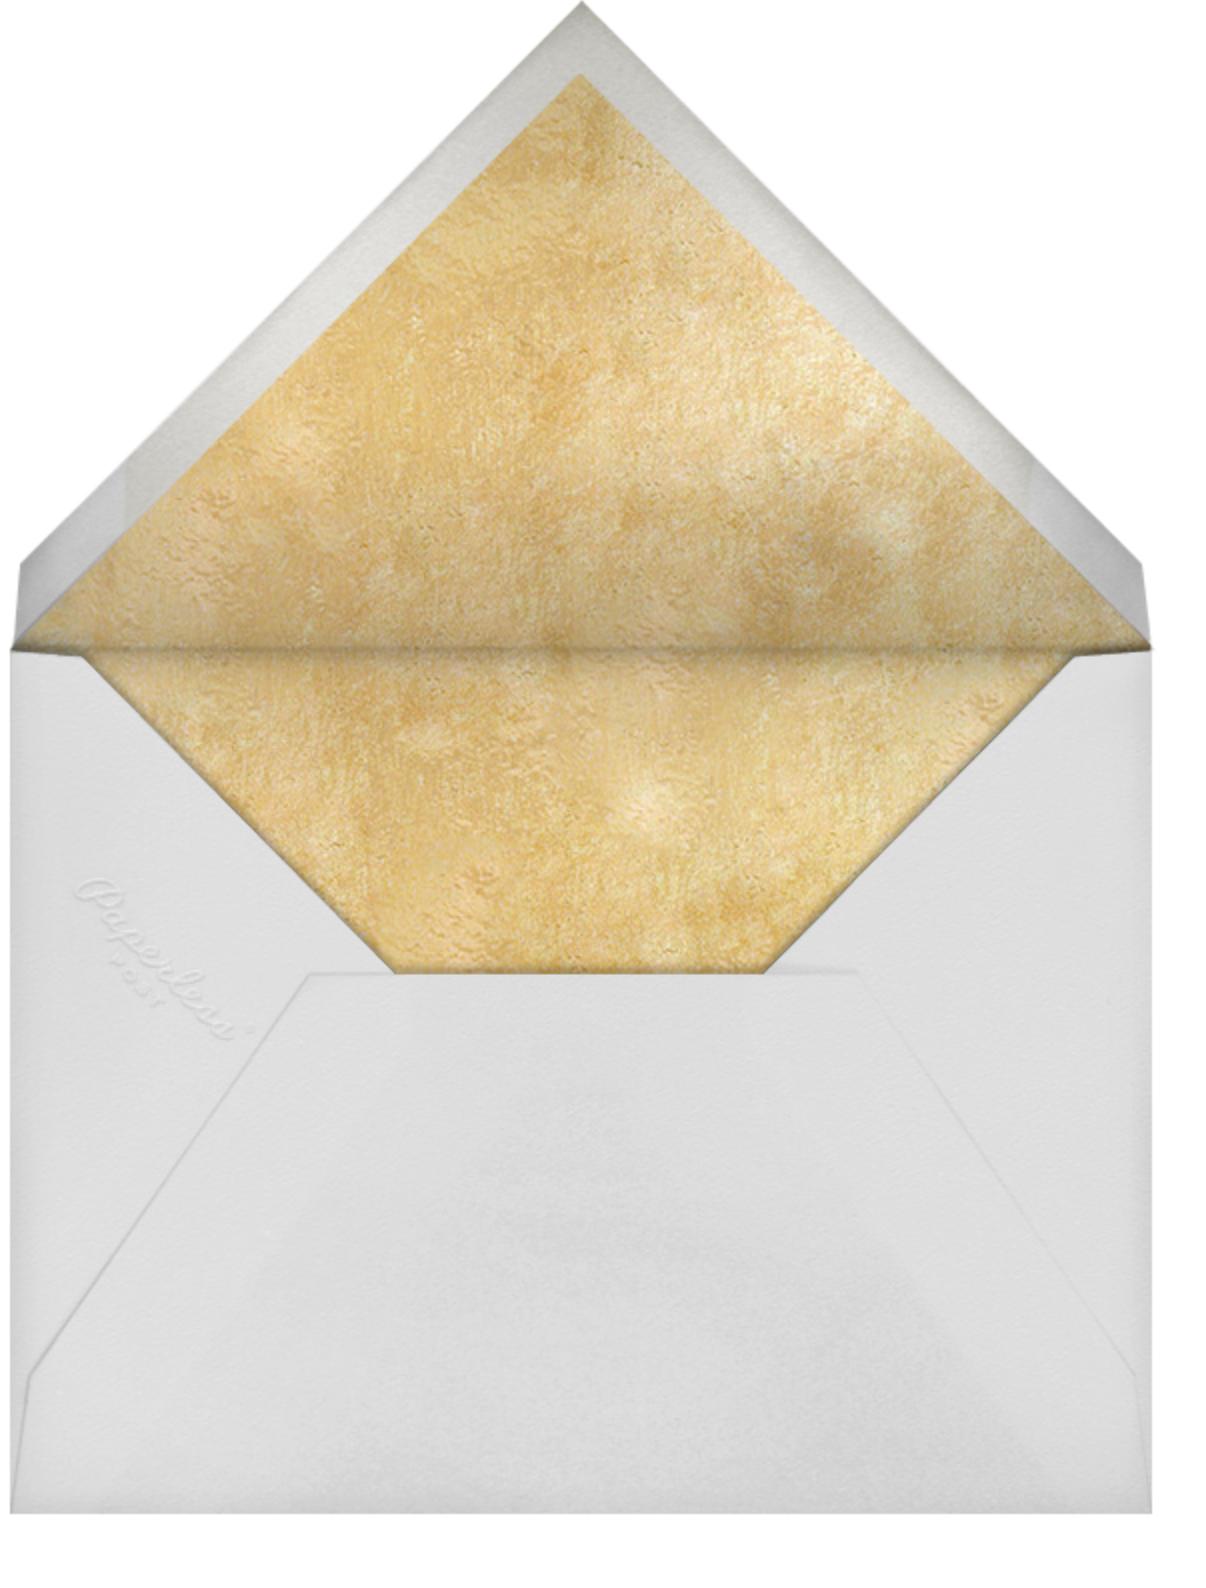 Belle Boulevard (Stationery) - Gold - kate spade new york - Personalized stationery - envelope back